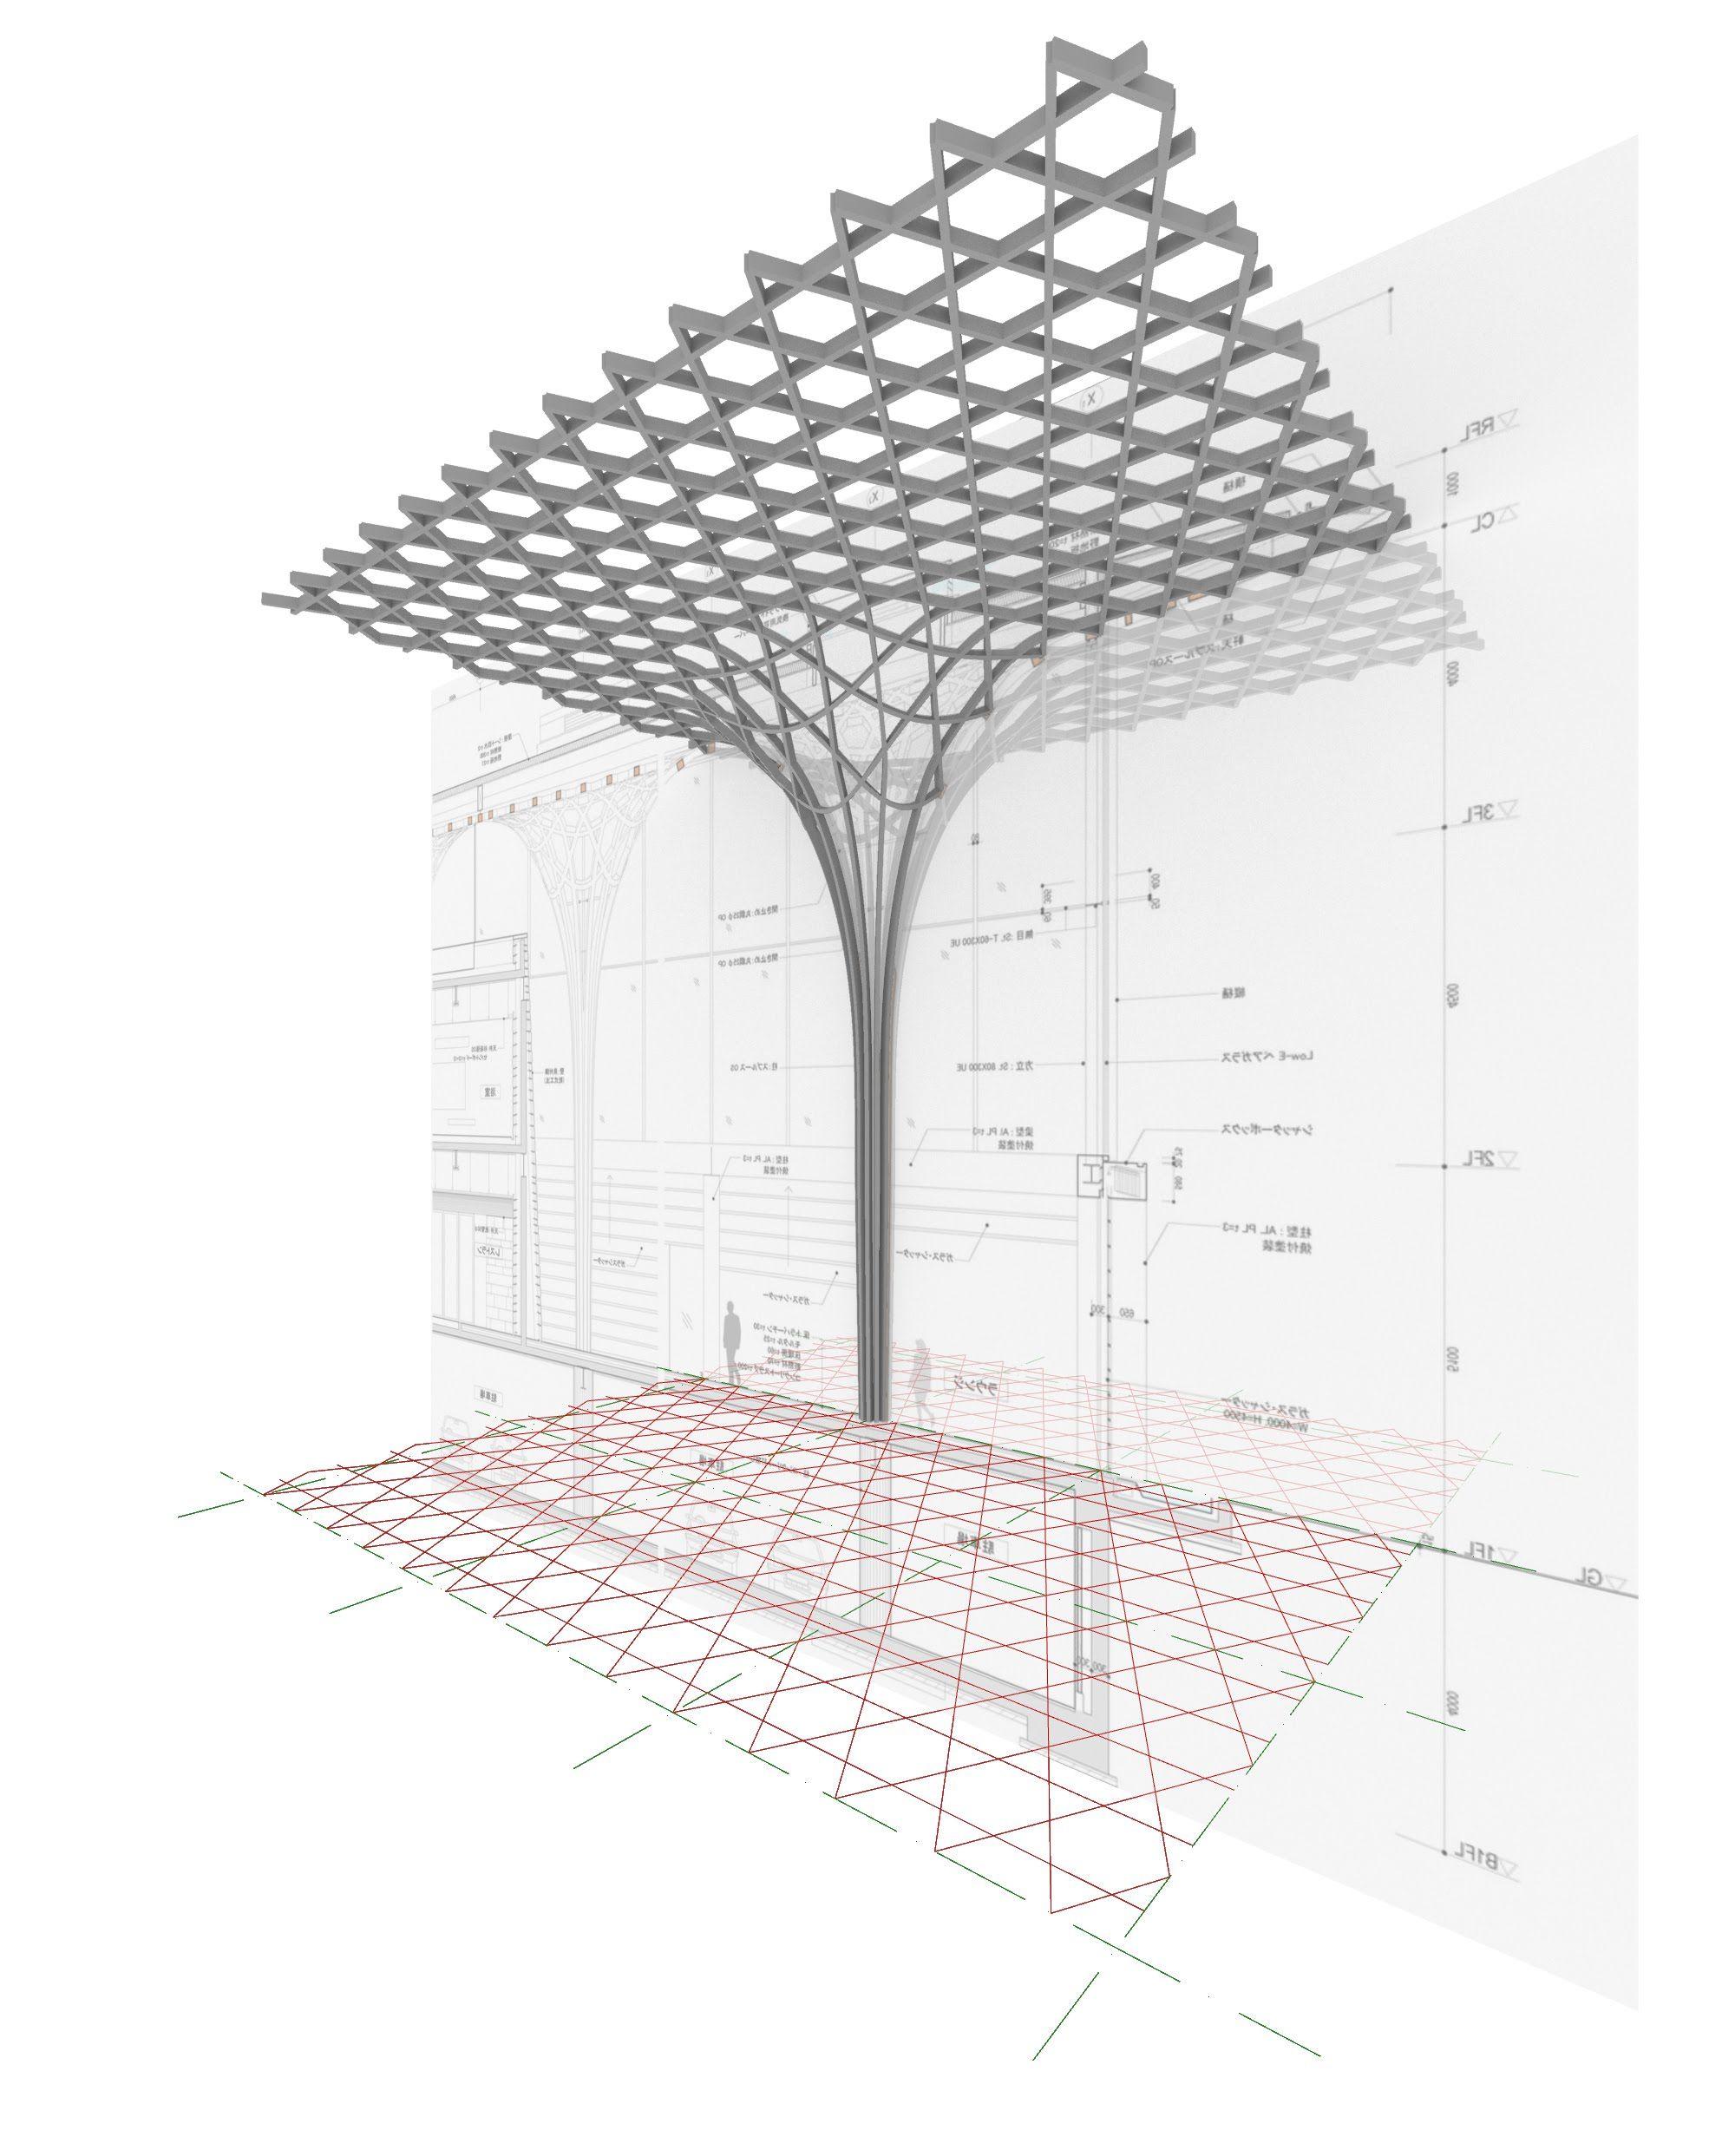 rhino tutorial club house shigeru ban 1 3 grasshopper rhino rhino tutorial club house shigeru ban 1 3 parametric architectureparametric designgrasshopper